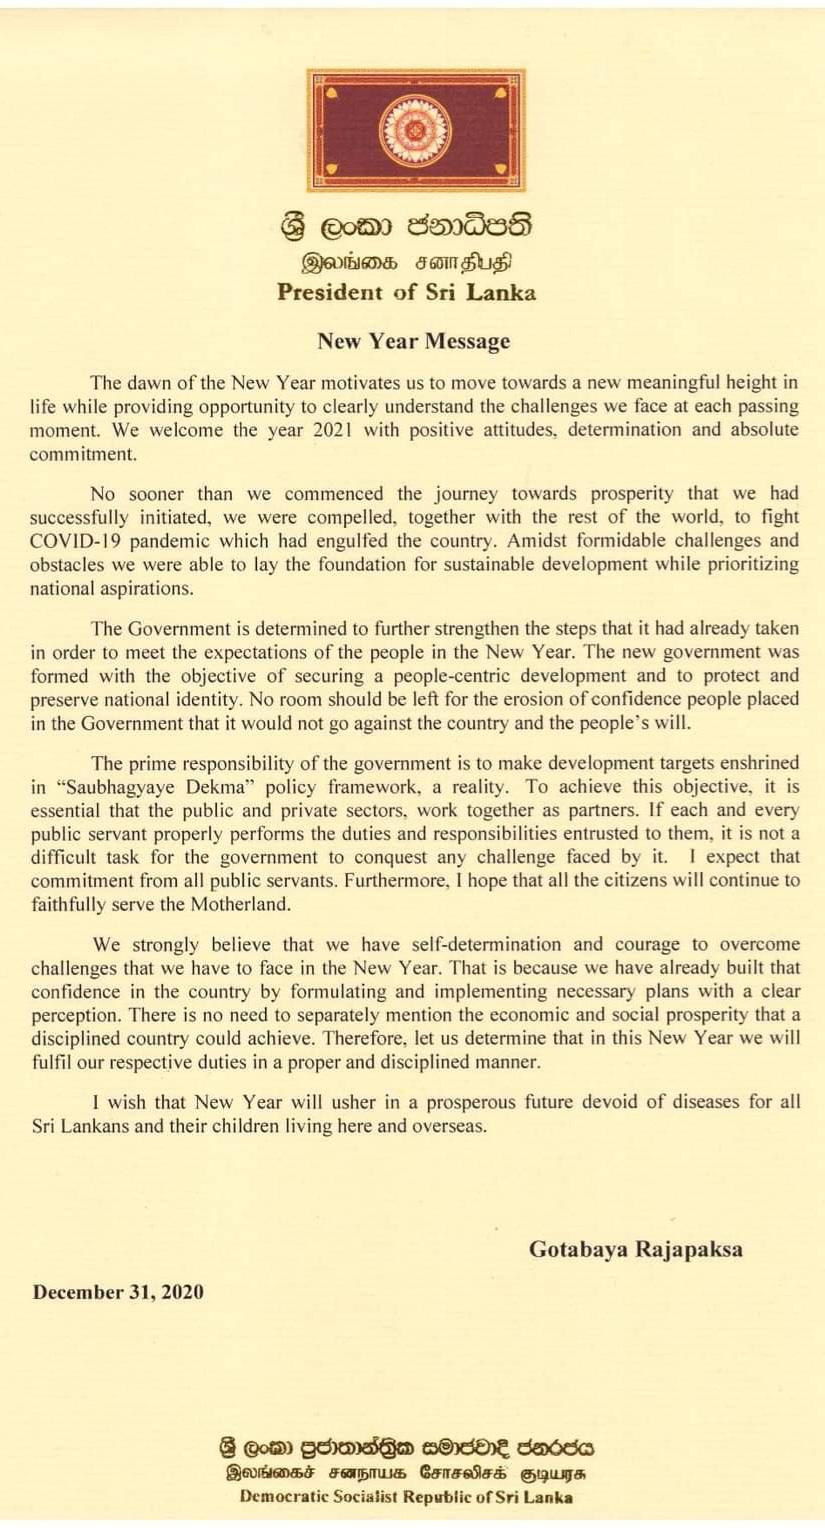 President Gotabaya's New Year Message